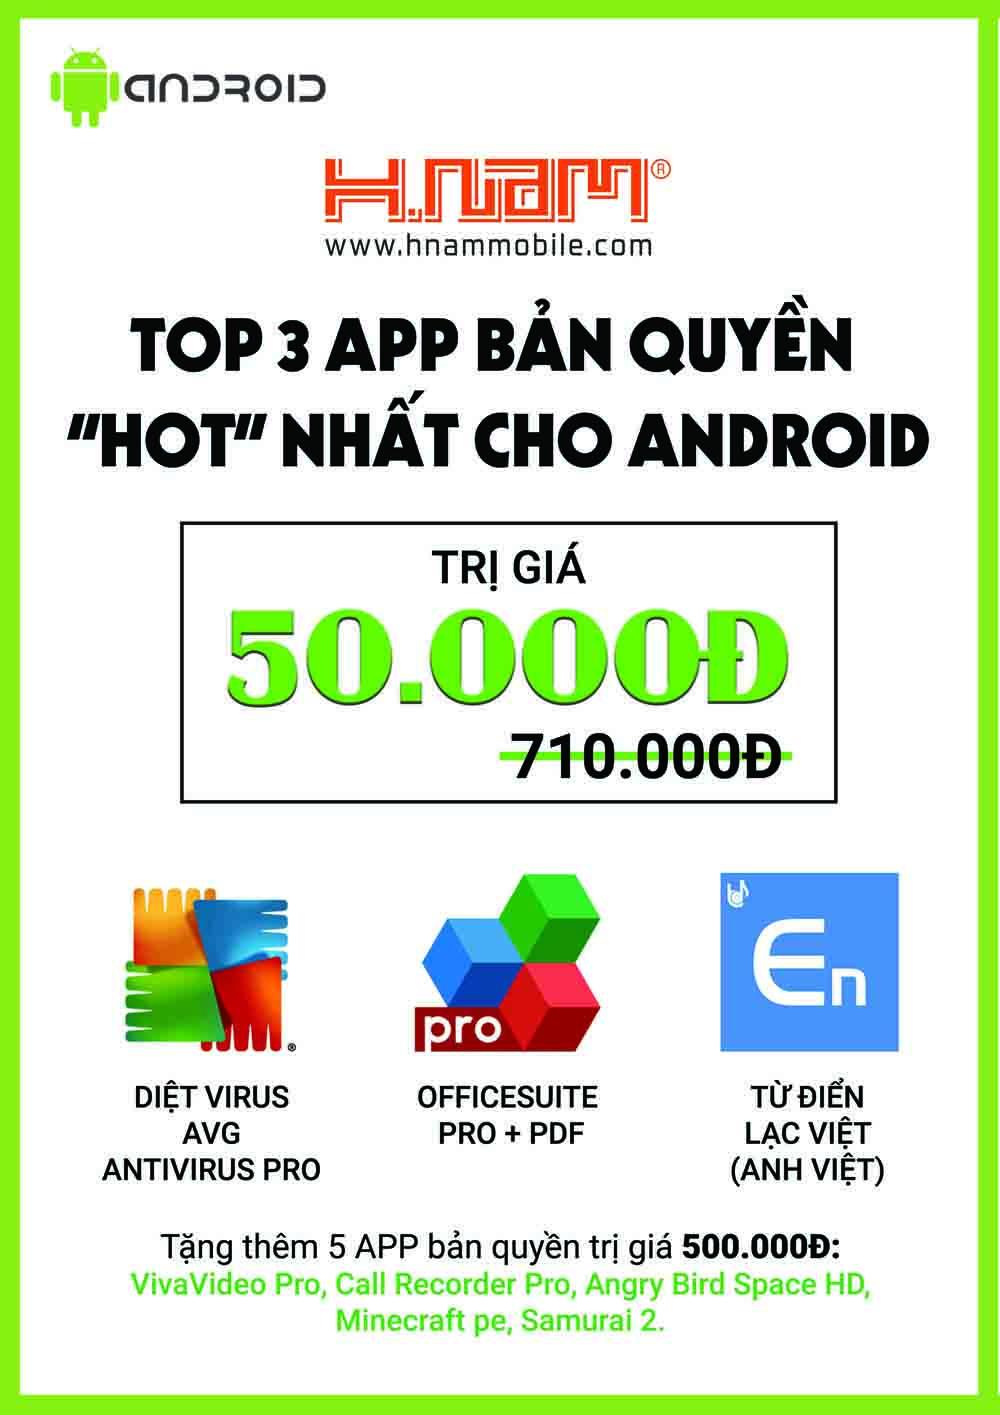 Top 3 app bản quyền